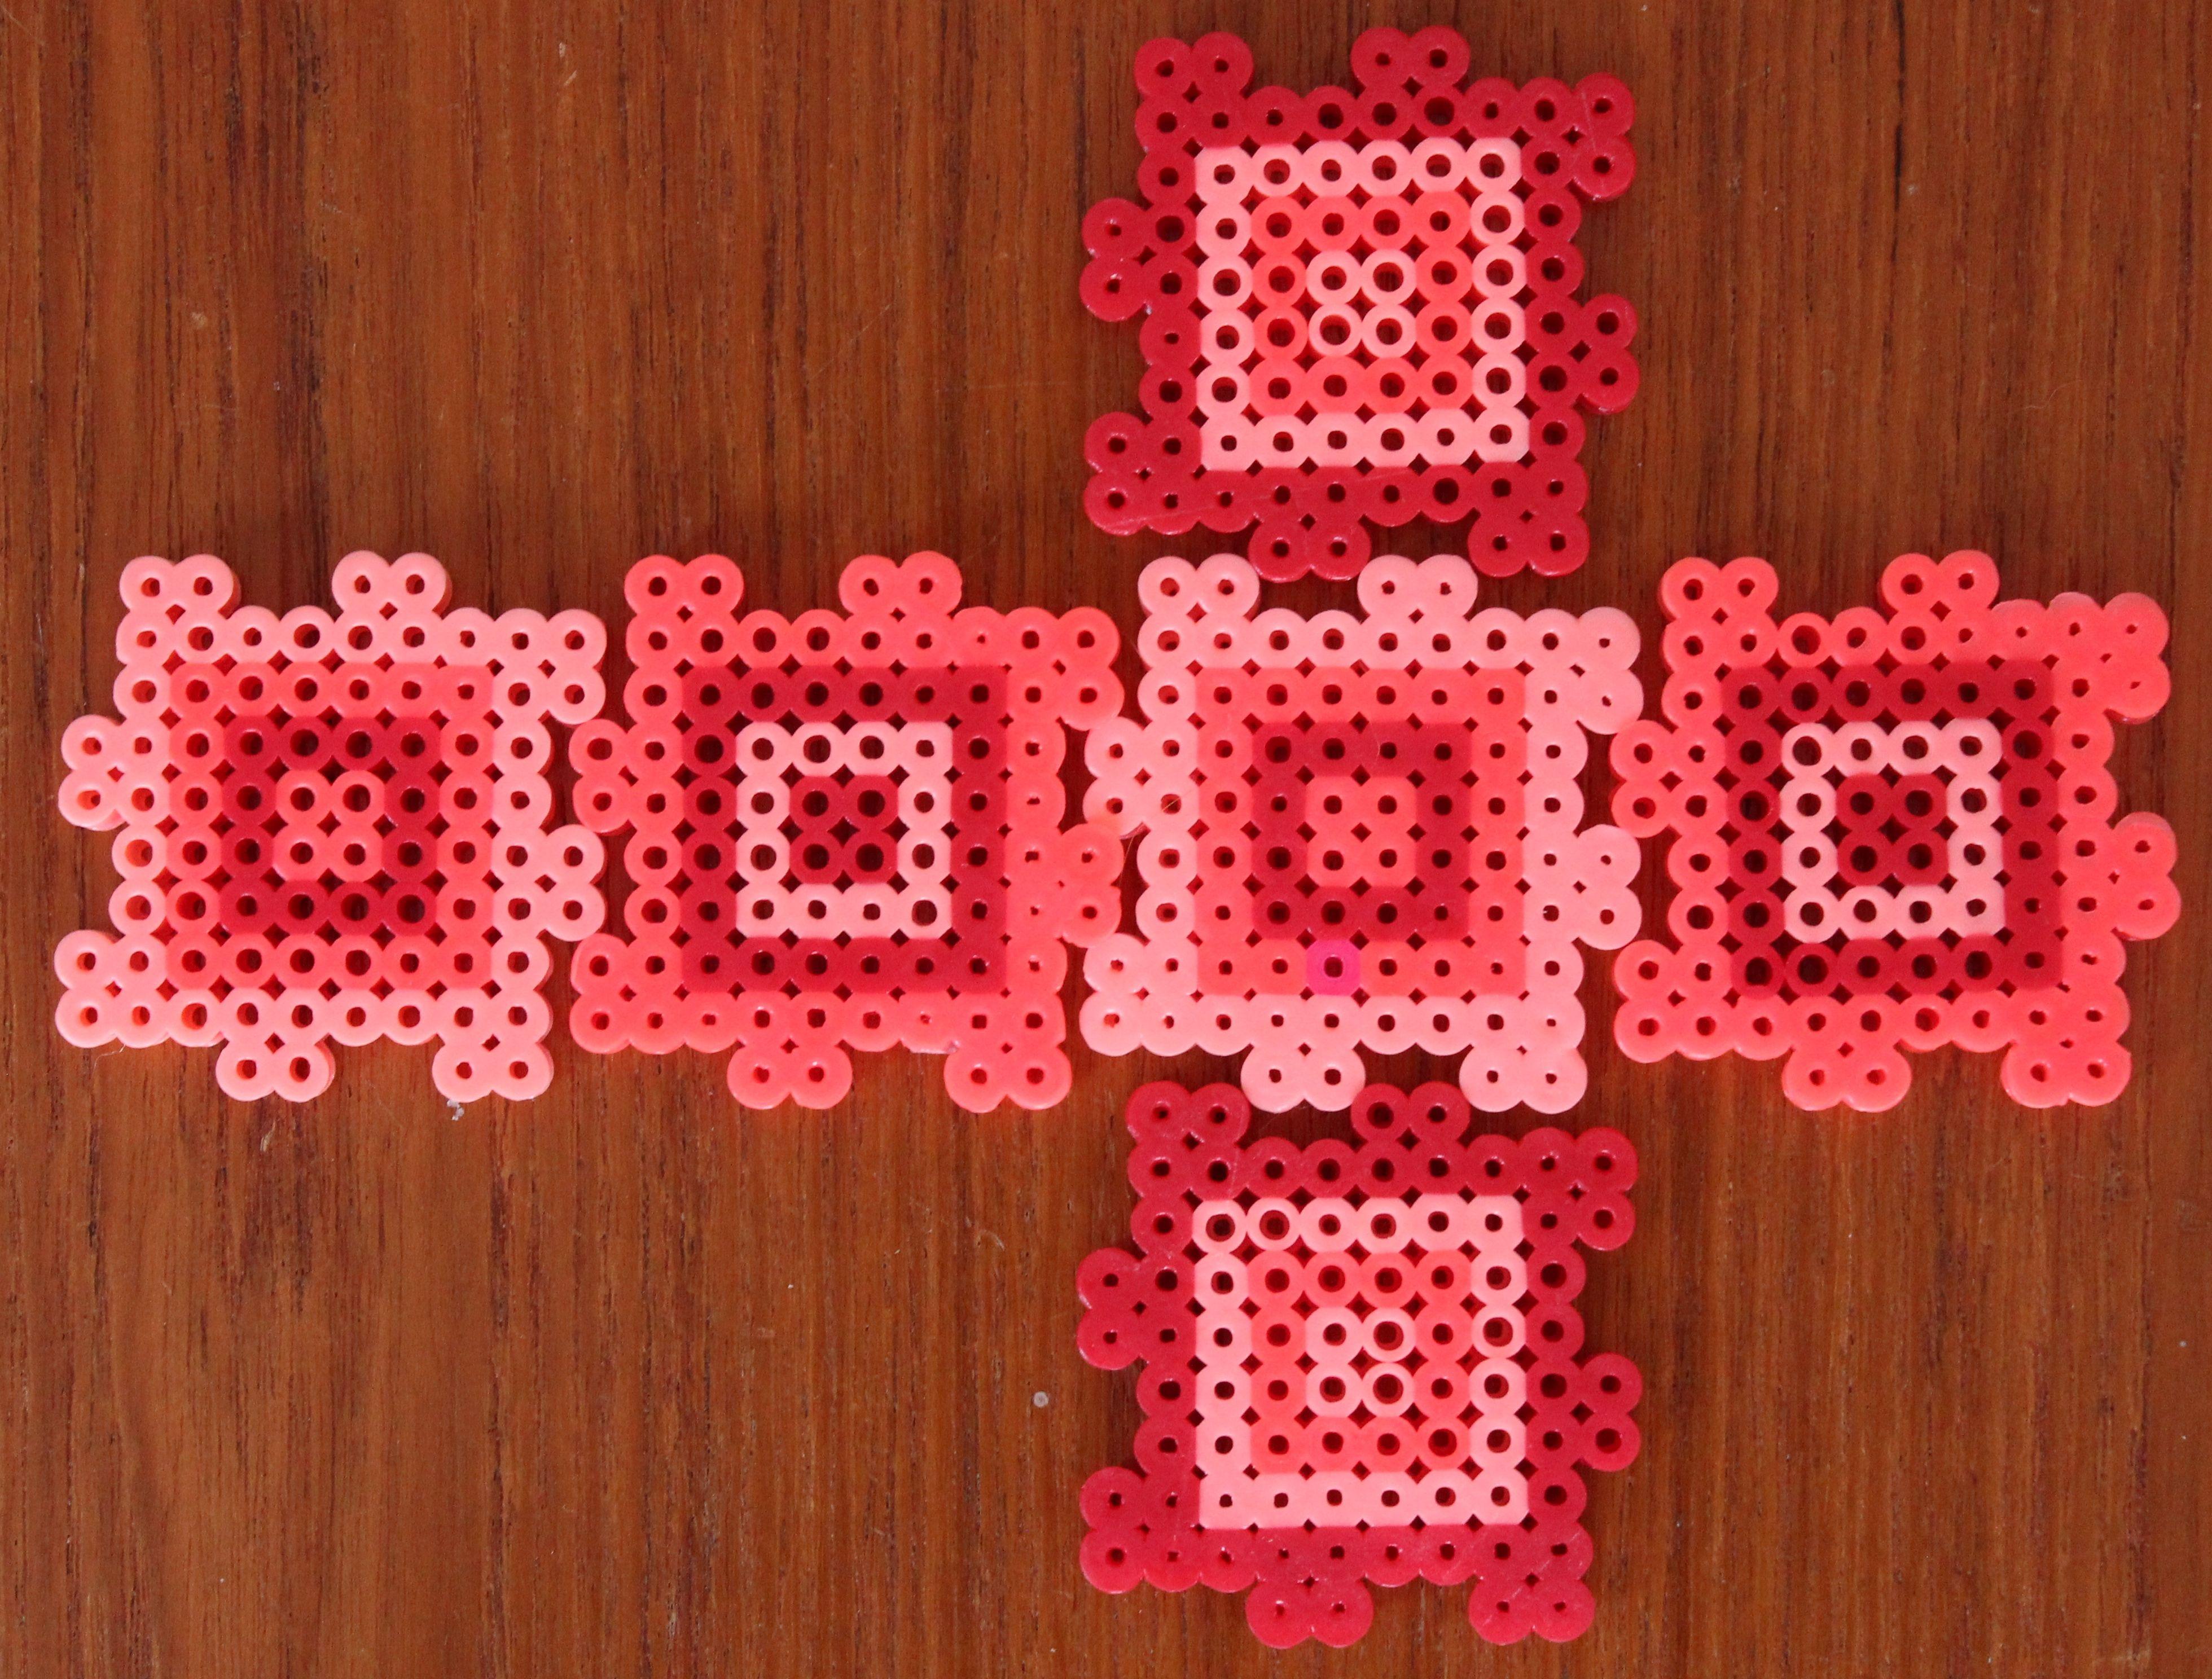 Keepsake Boxes | Perler bead templates, Diy perler beads, Perler bead artPinterest